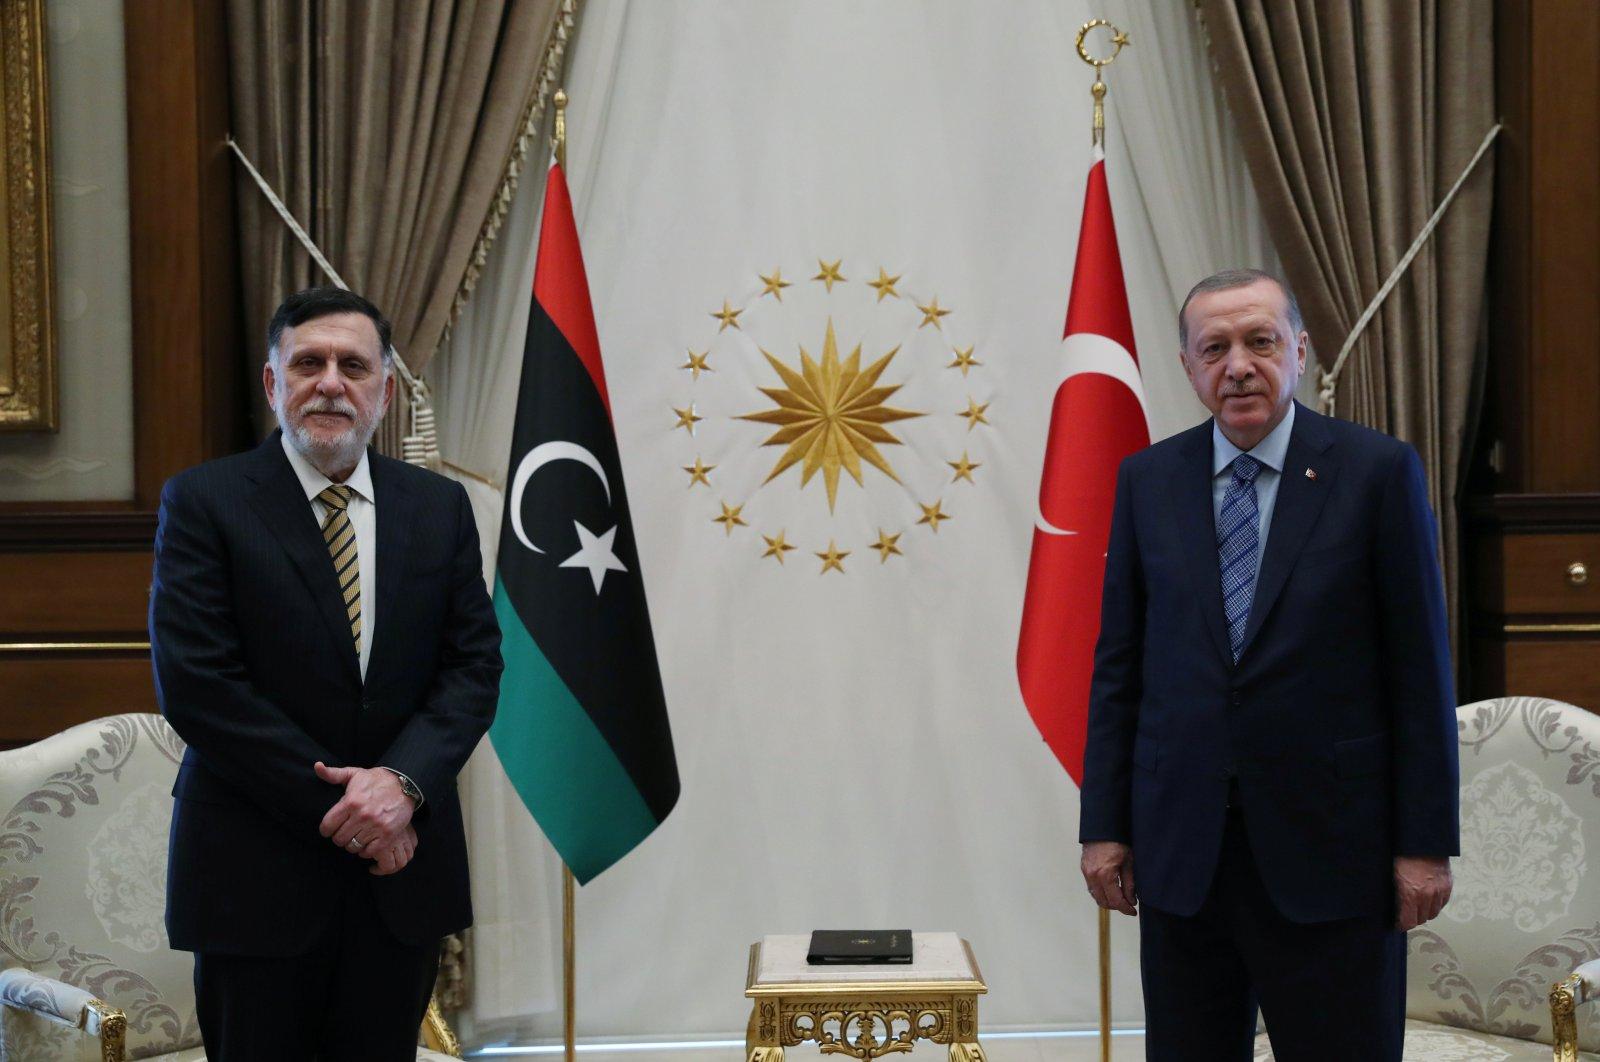 President Tayyip Erdoğan meets with Libya's internationally recognized Prime Minister Fayez al-Sarraj at the Presidential Palace, Ankara, Turkey, June 4, 2020. (REUTERS Photo)